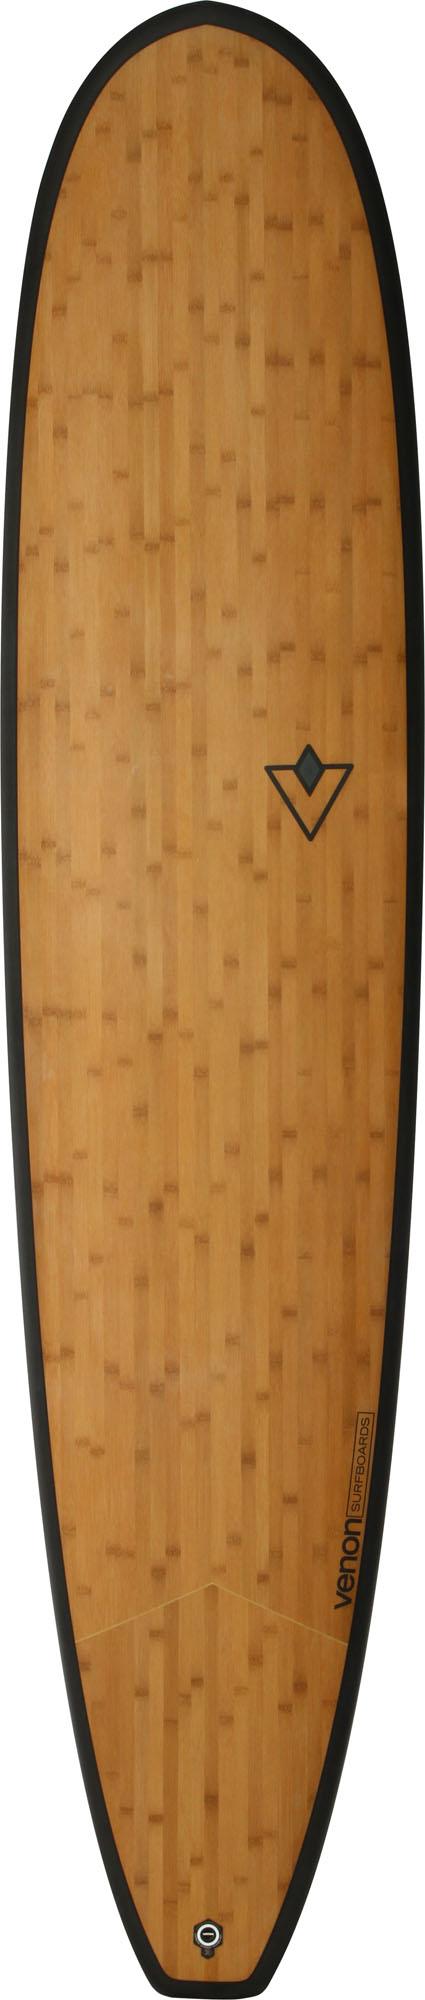 VENON CARBON BAMBOO WOODIE - Tablas de Surf